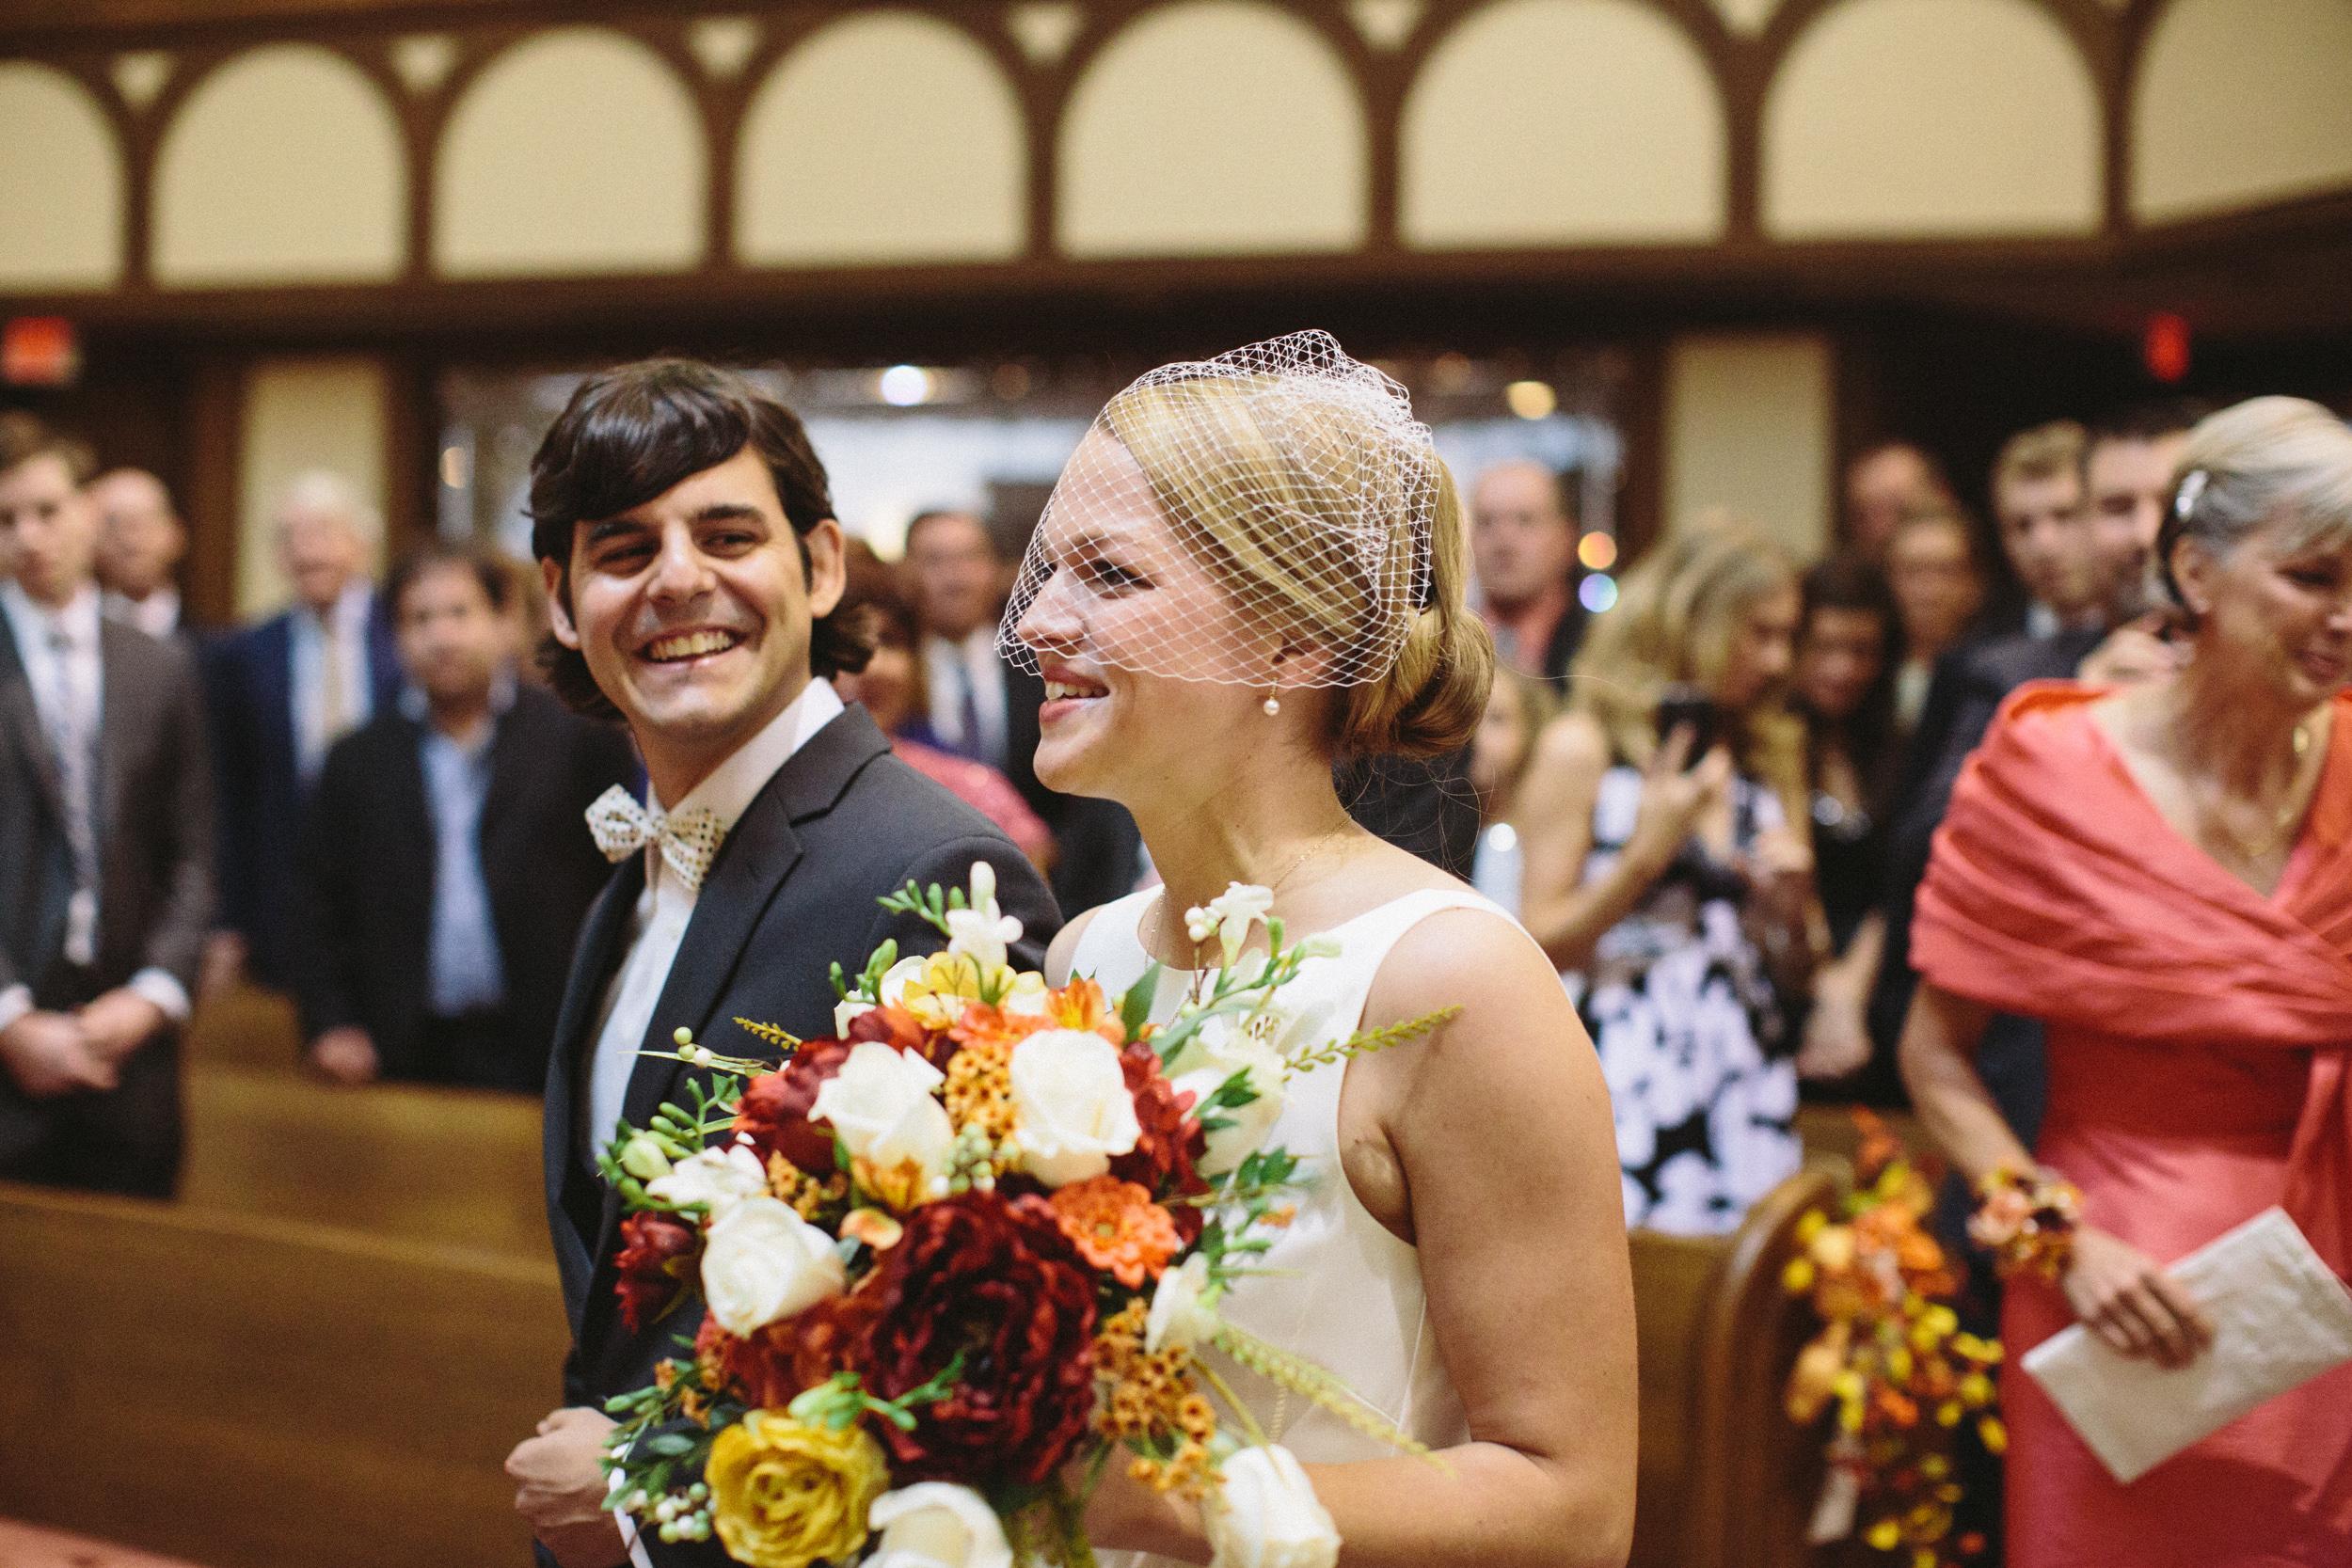 10-05-2013 maggie & adam wedding photography by brian milo-127.jpg